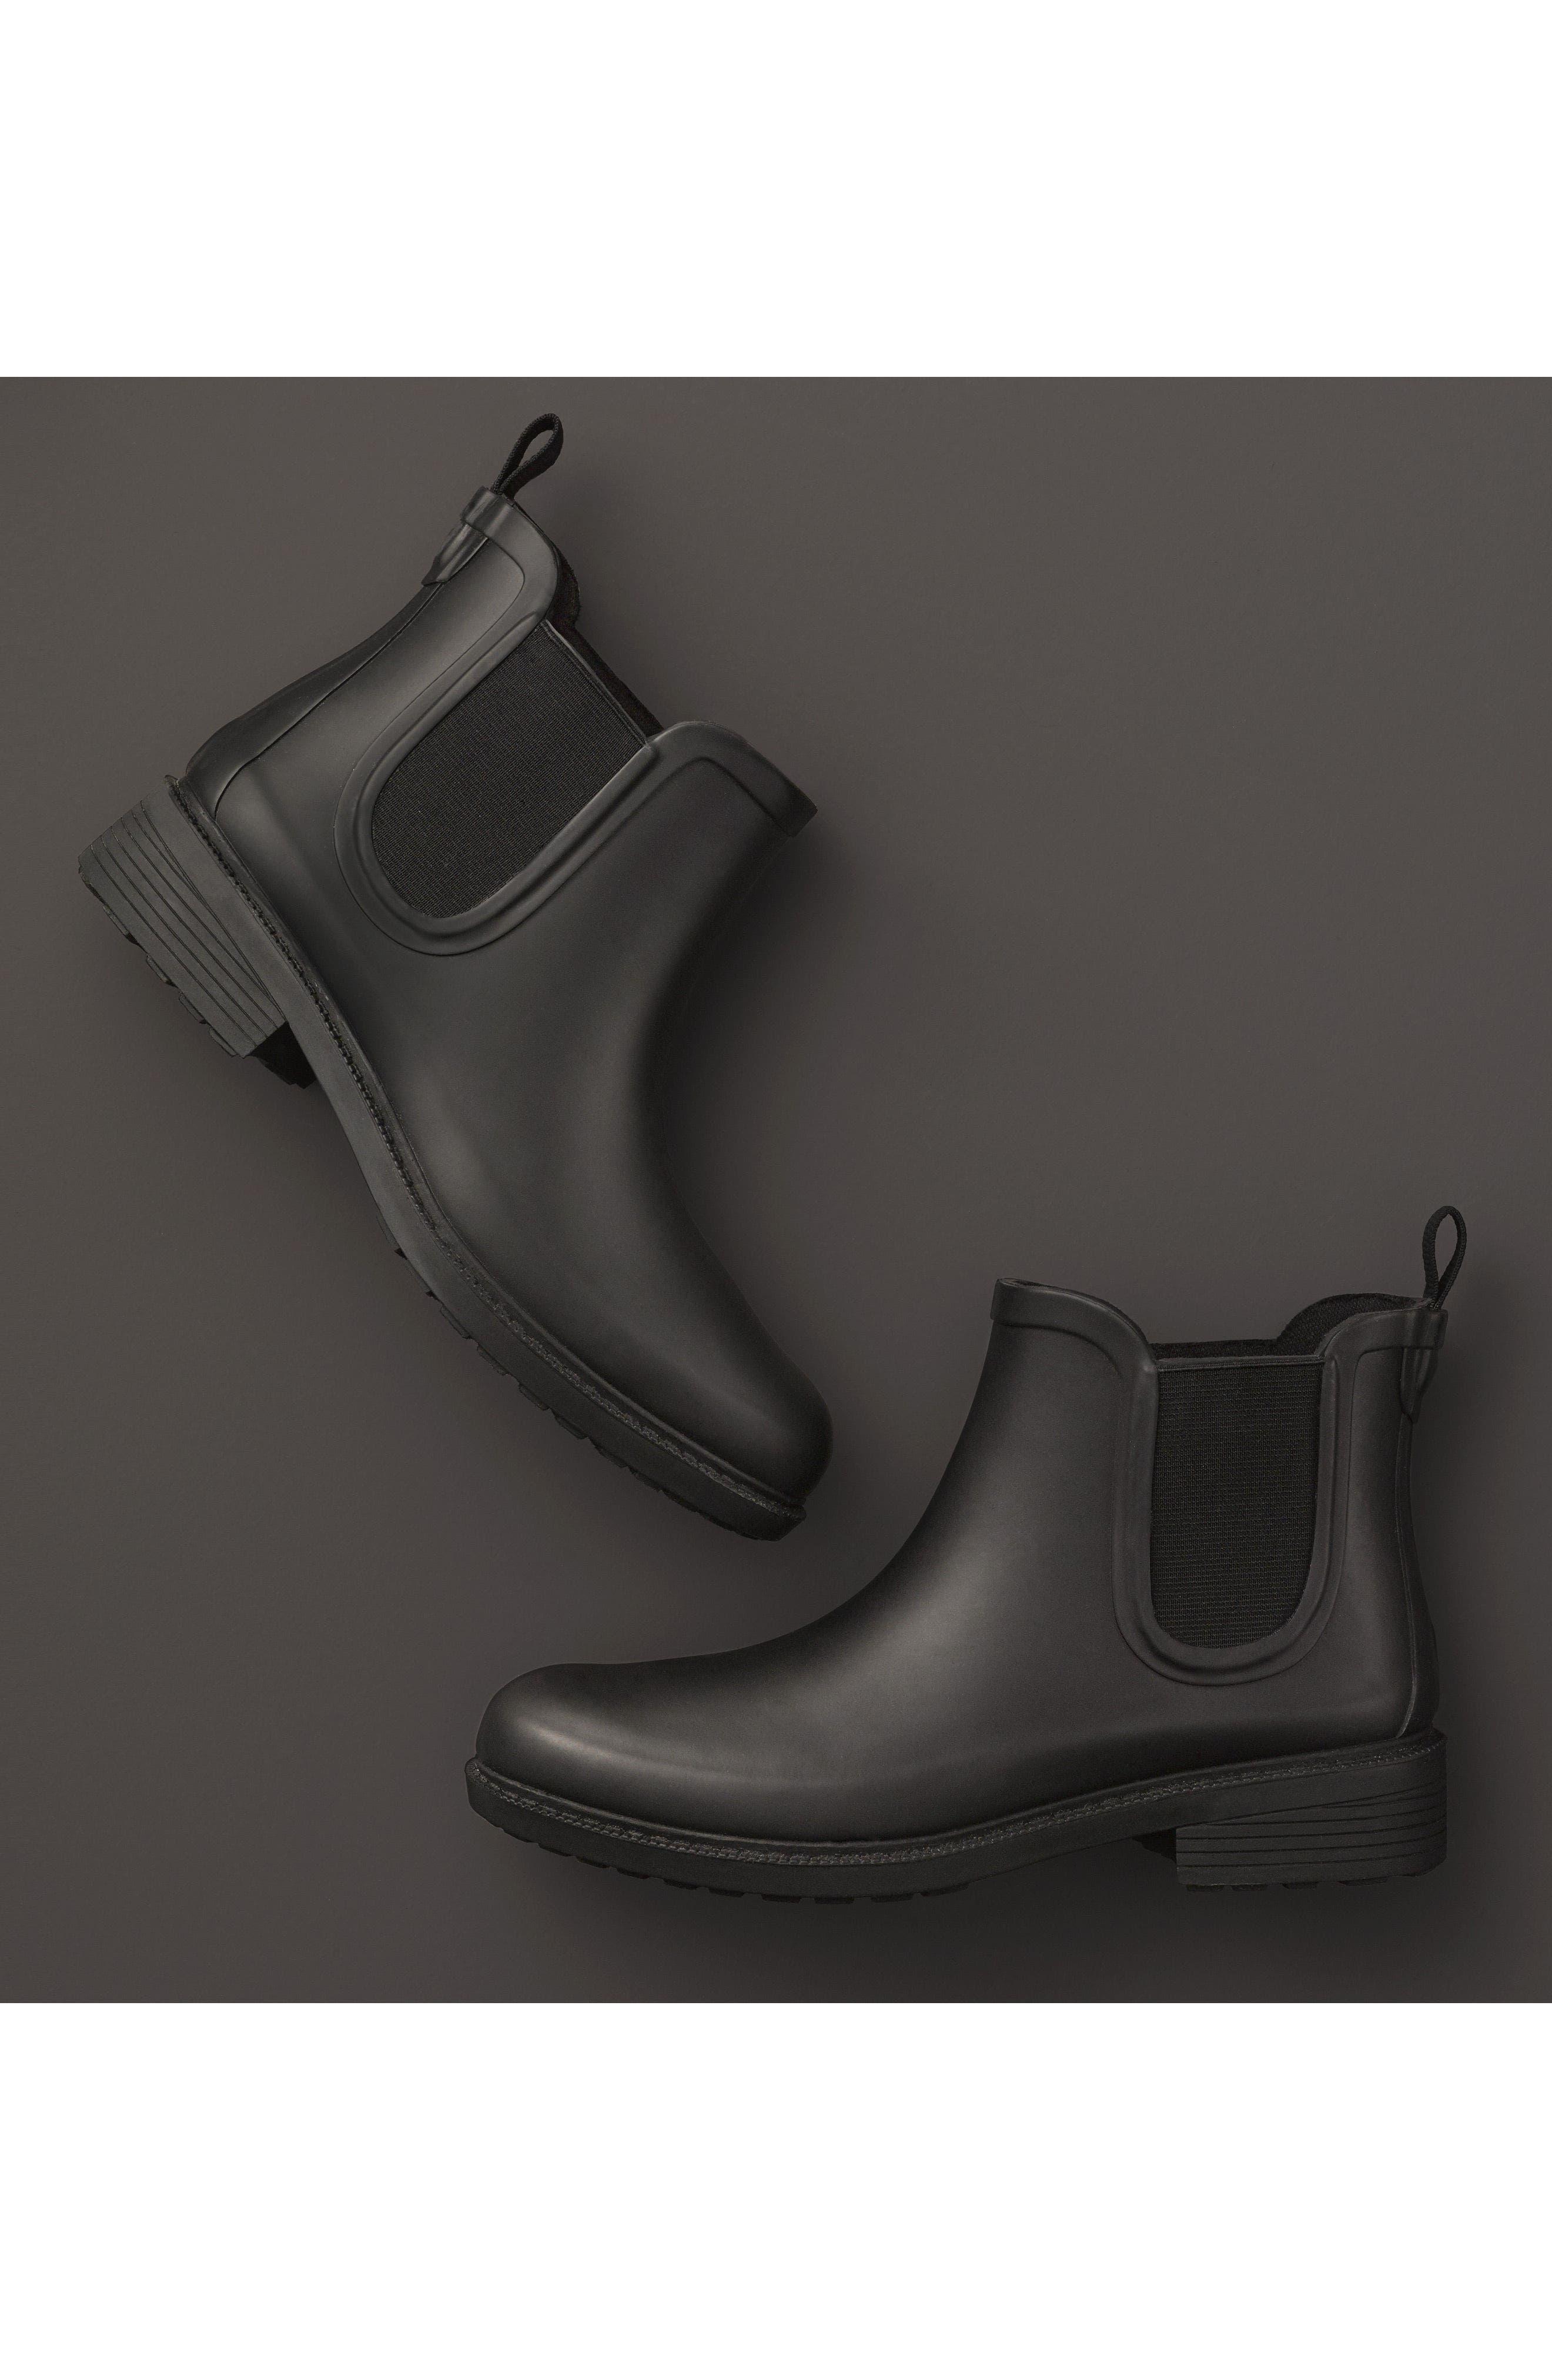 MADEWELL, The Chelsea Rain Boot, Alternate thumbnail 10, color, TRUE BLACK RUBBER